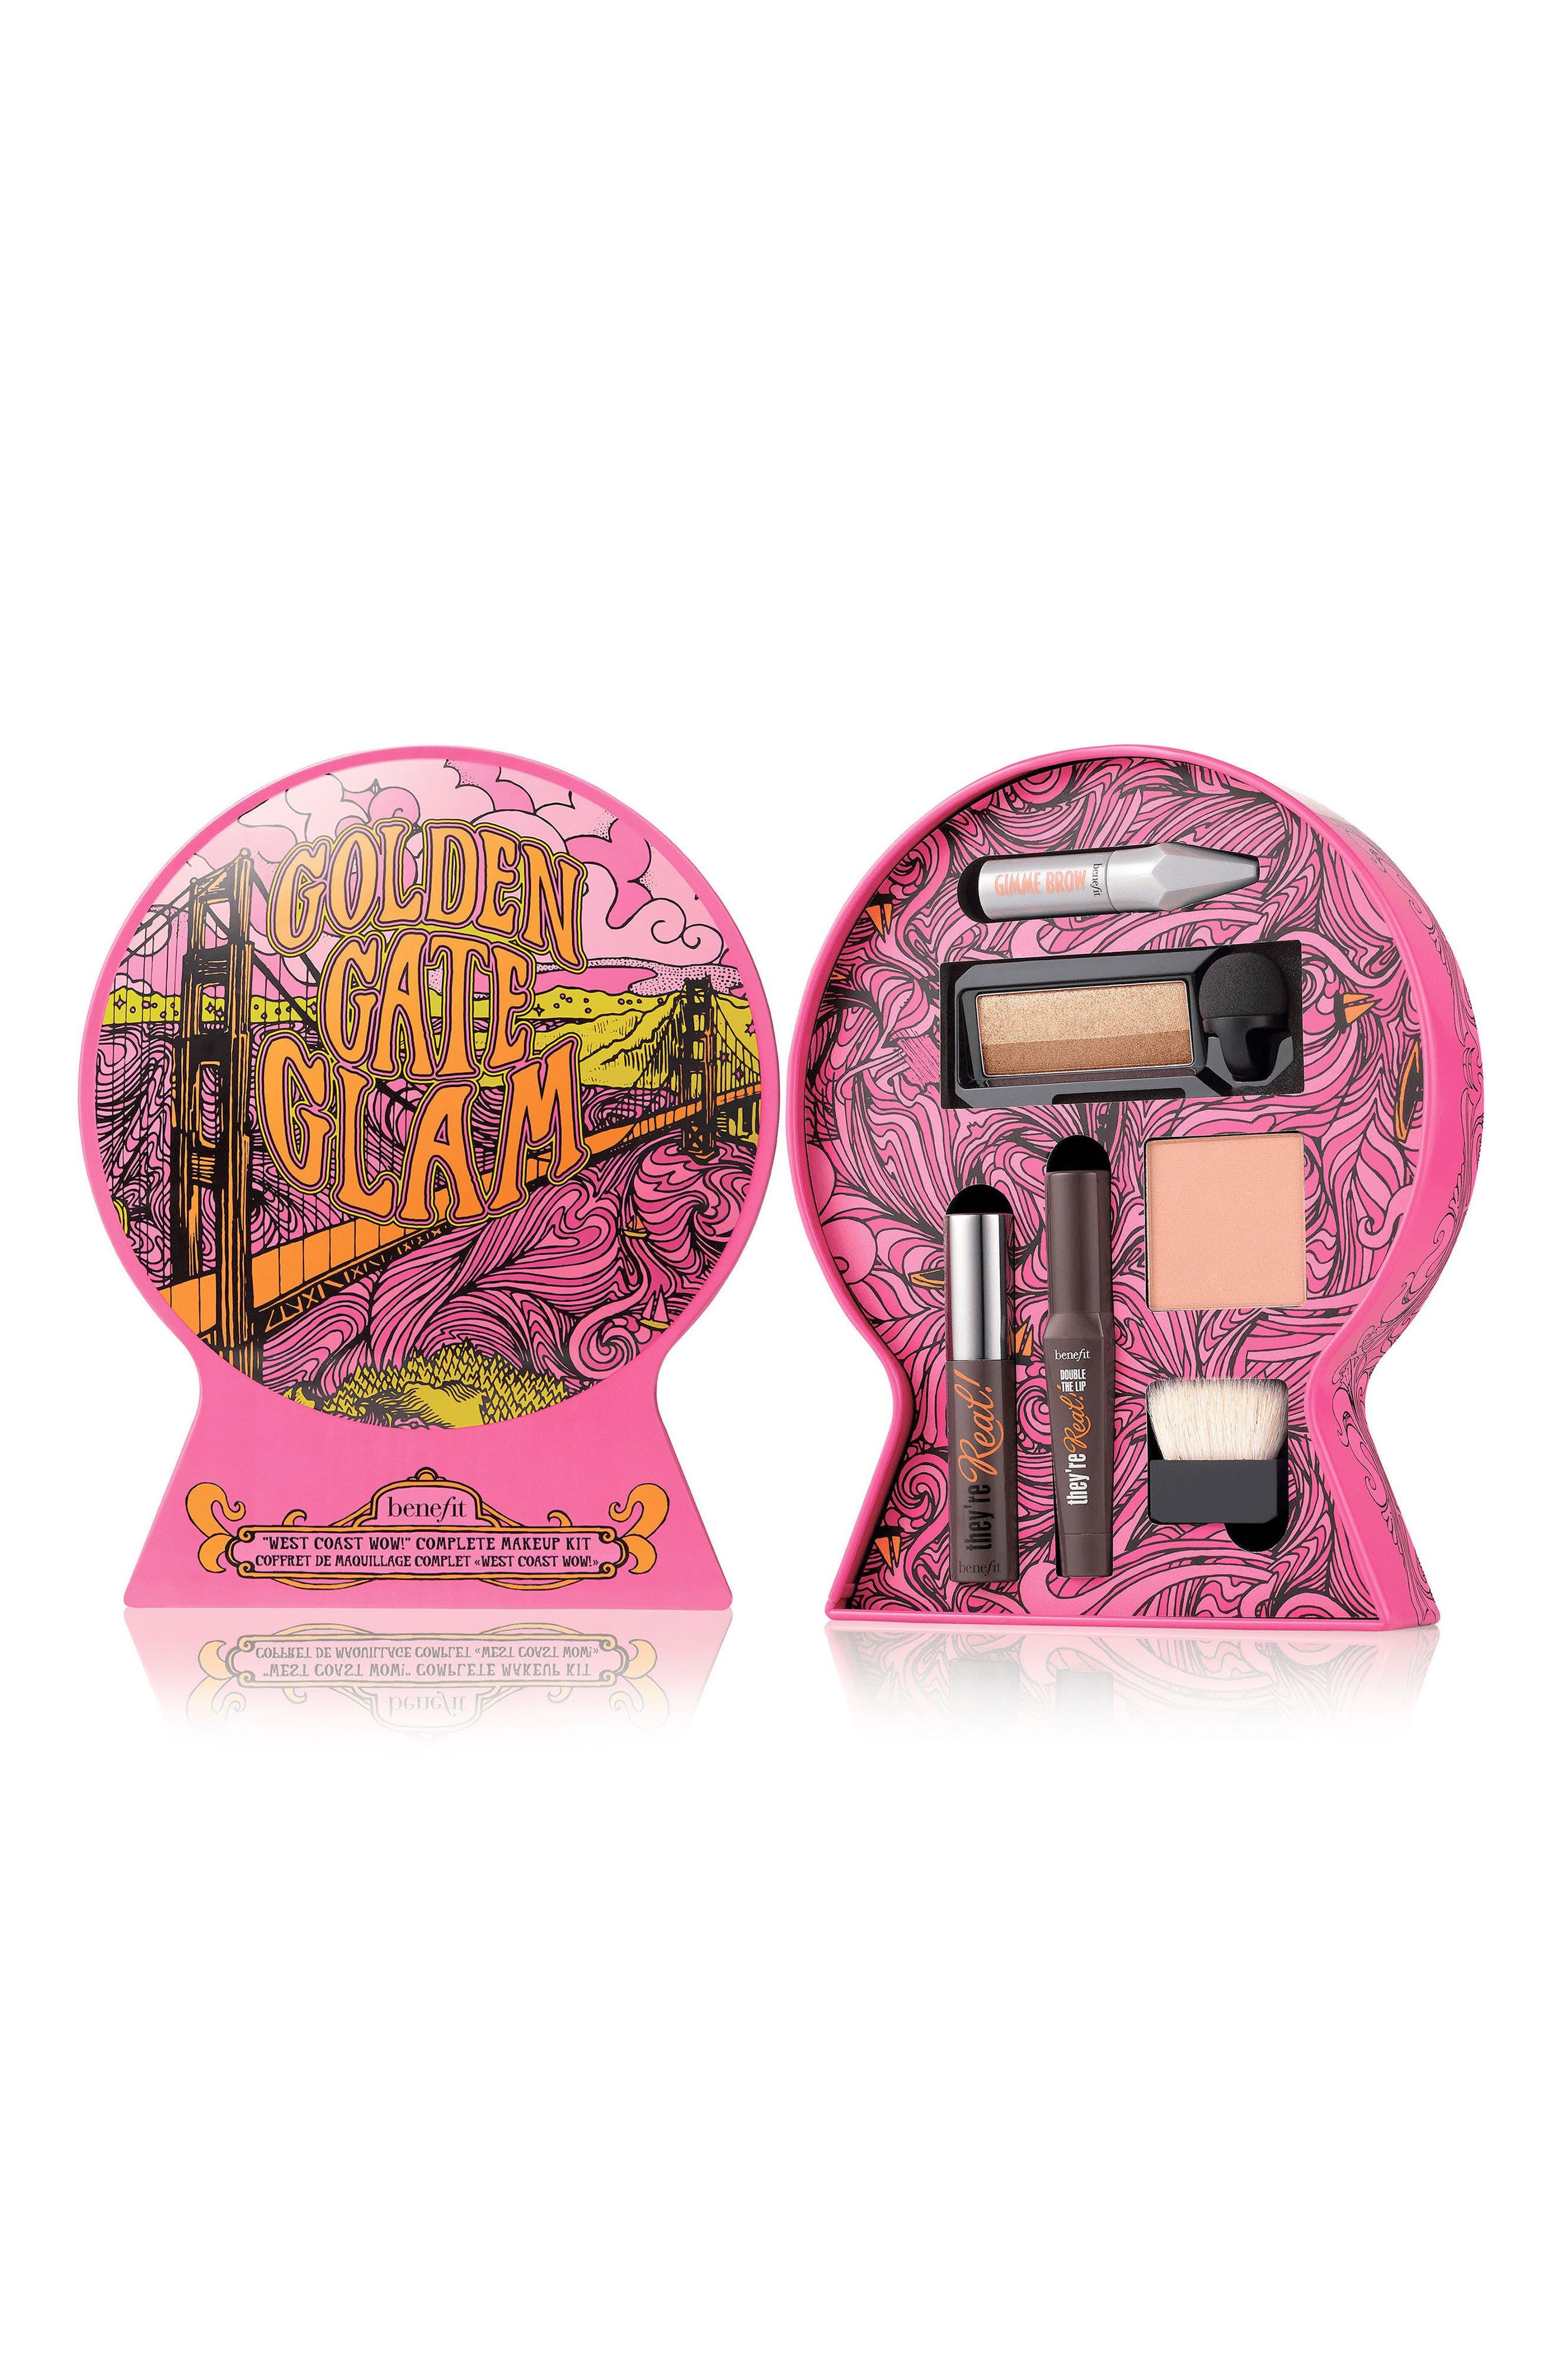 Benefit Golden Gate Glam Complete Makeup Kit,                             Alternate thumbnail 2, color,                             000